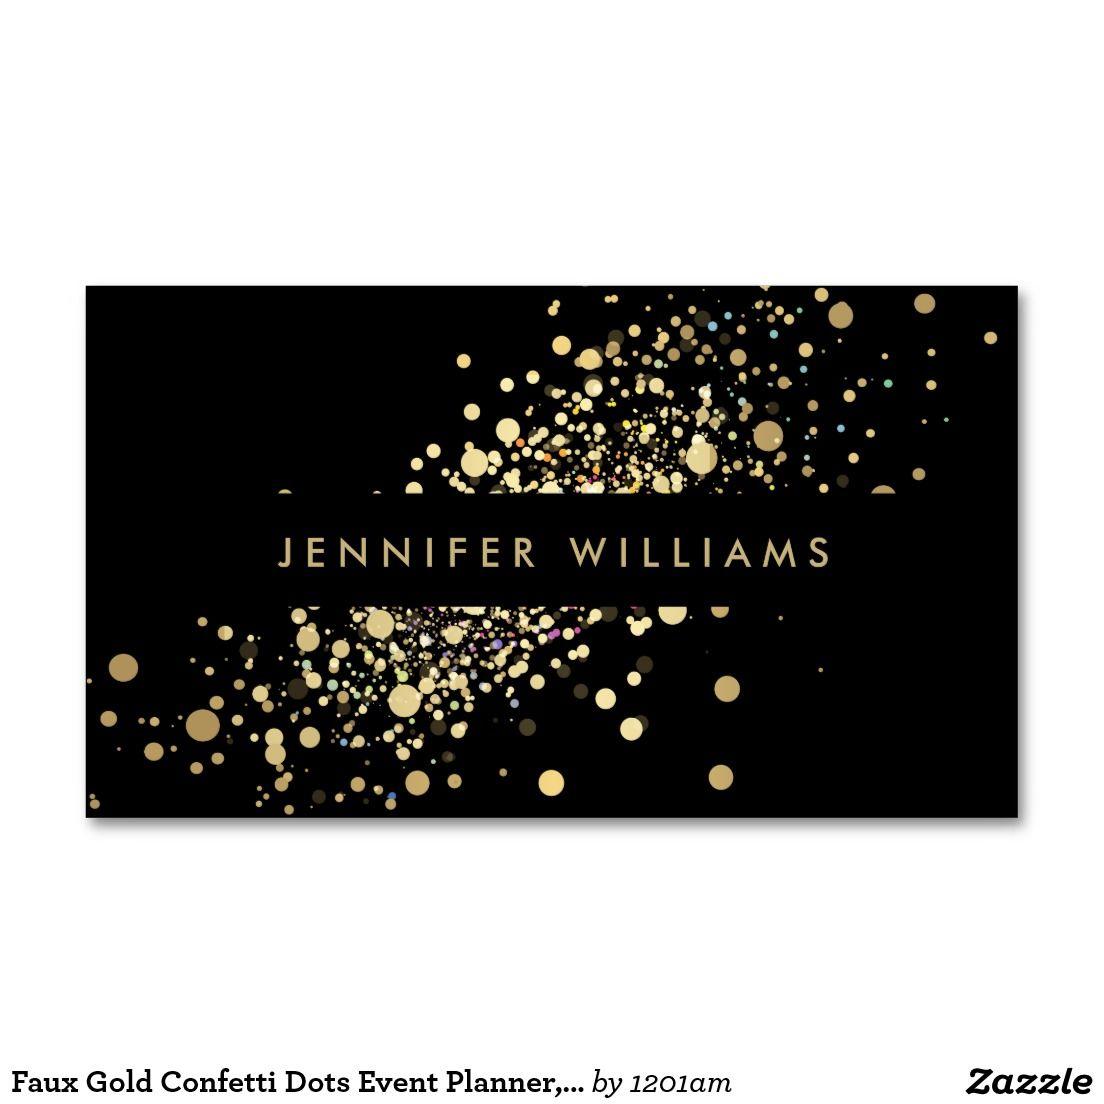 Faux Gold Confetti Dots Event Planner Stylist